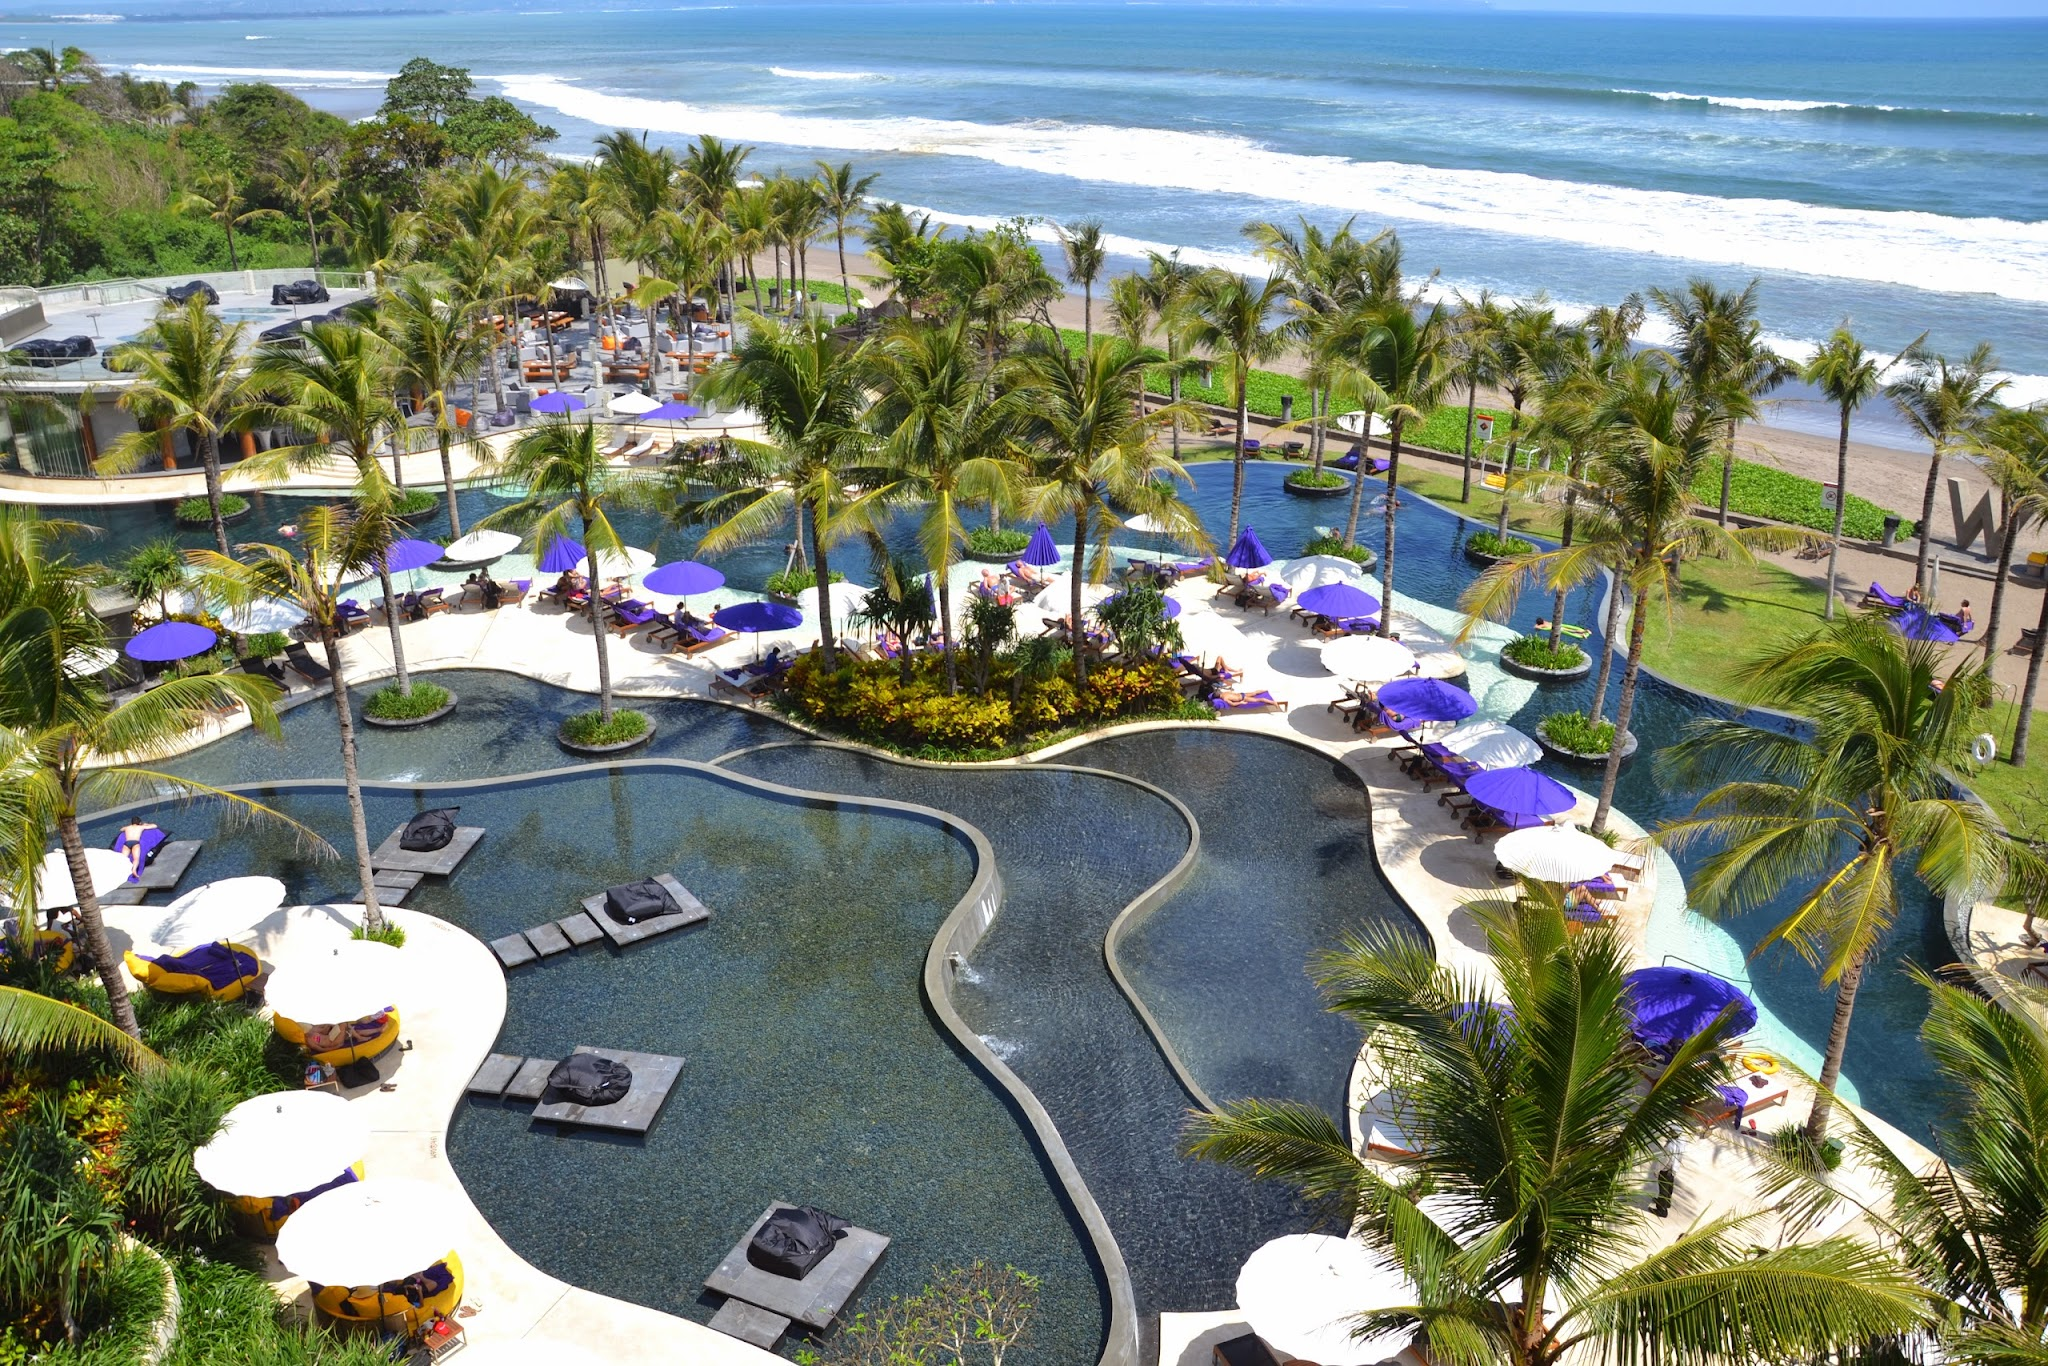 bali hotel resort